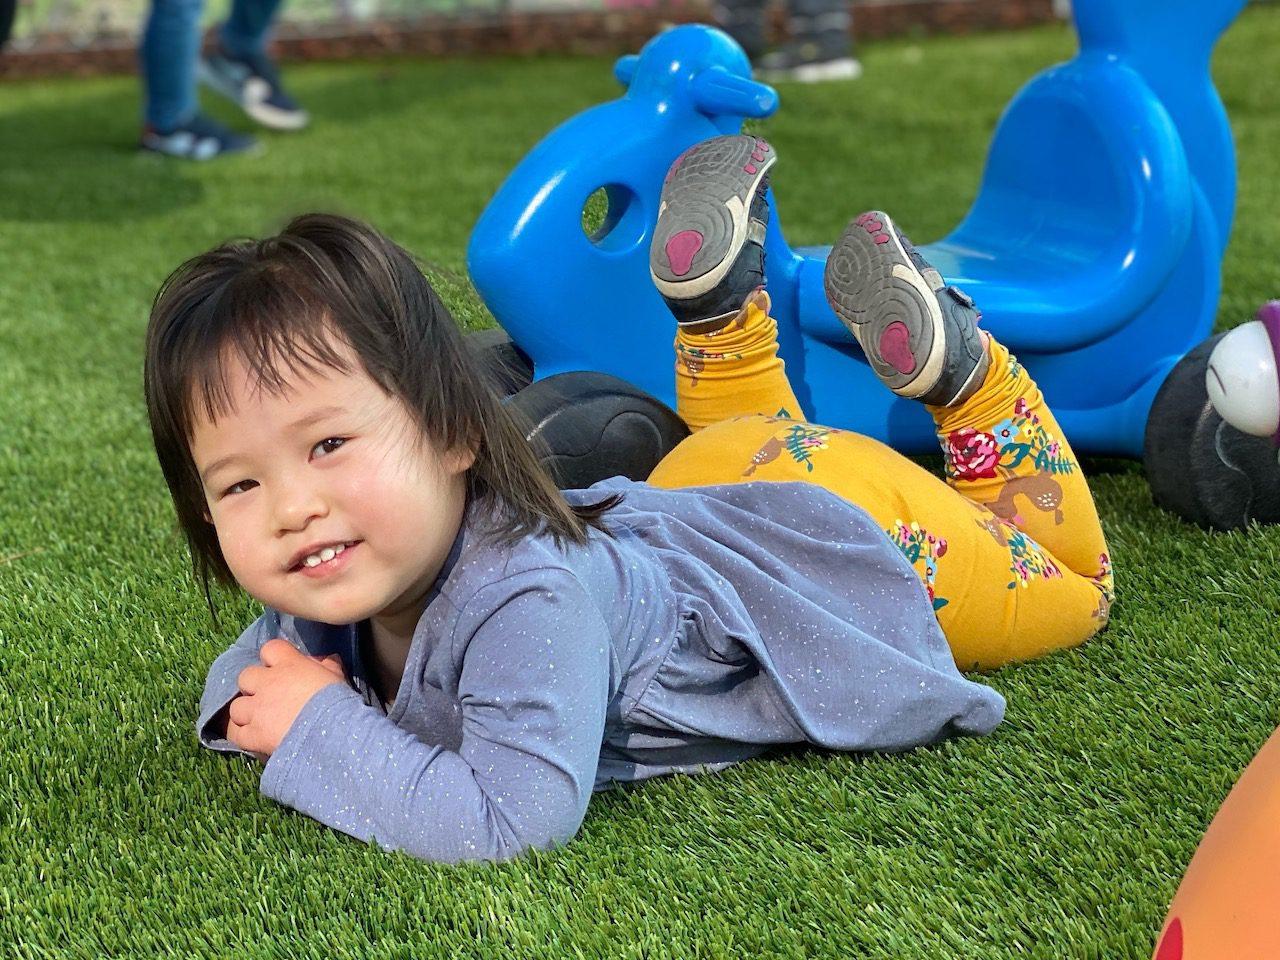 Happy Infant having fun rolling around soft turf